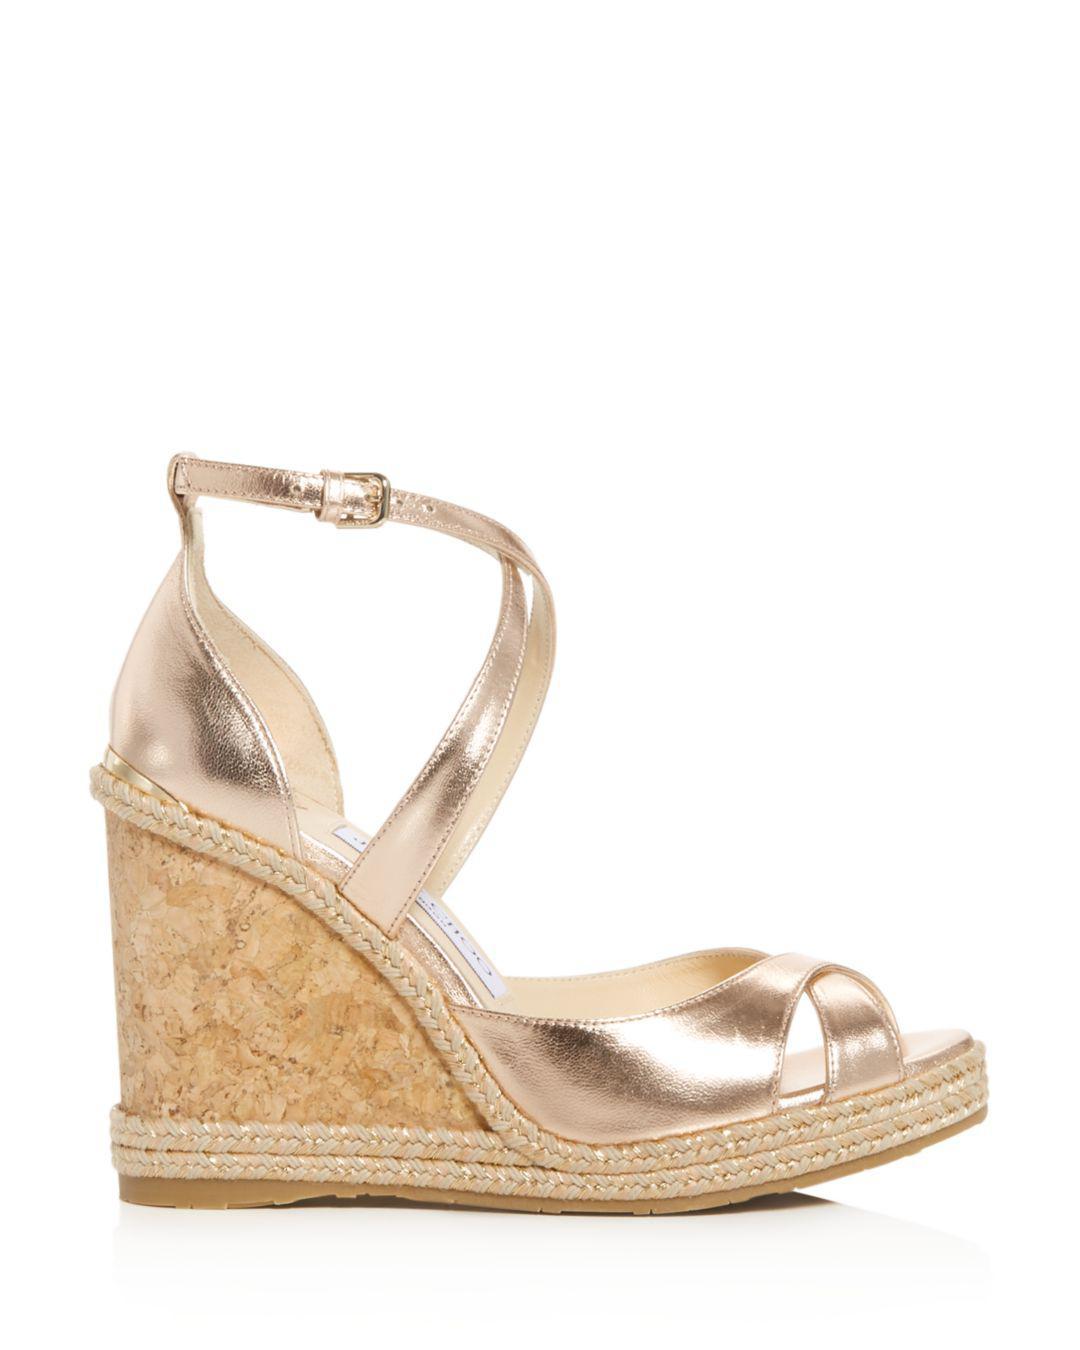 c7f4d57953d0 Lyst - Jimmy Choo Women s Alanah 105 Crisscross Wedge Sandals